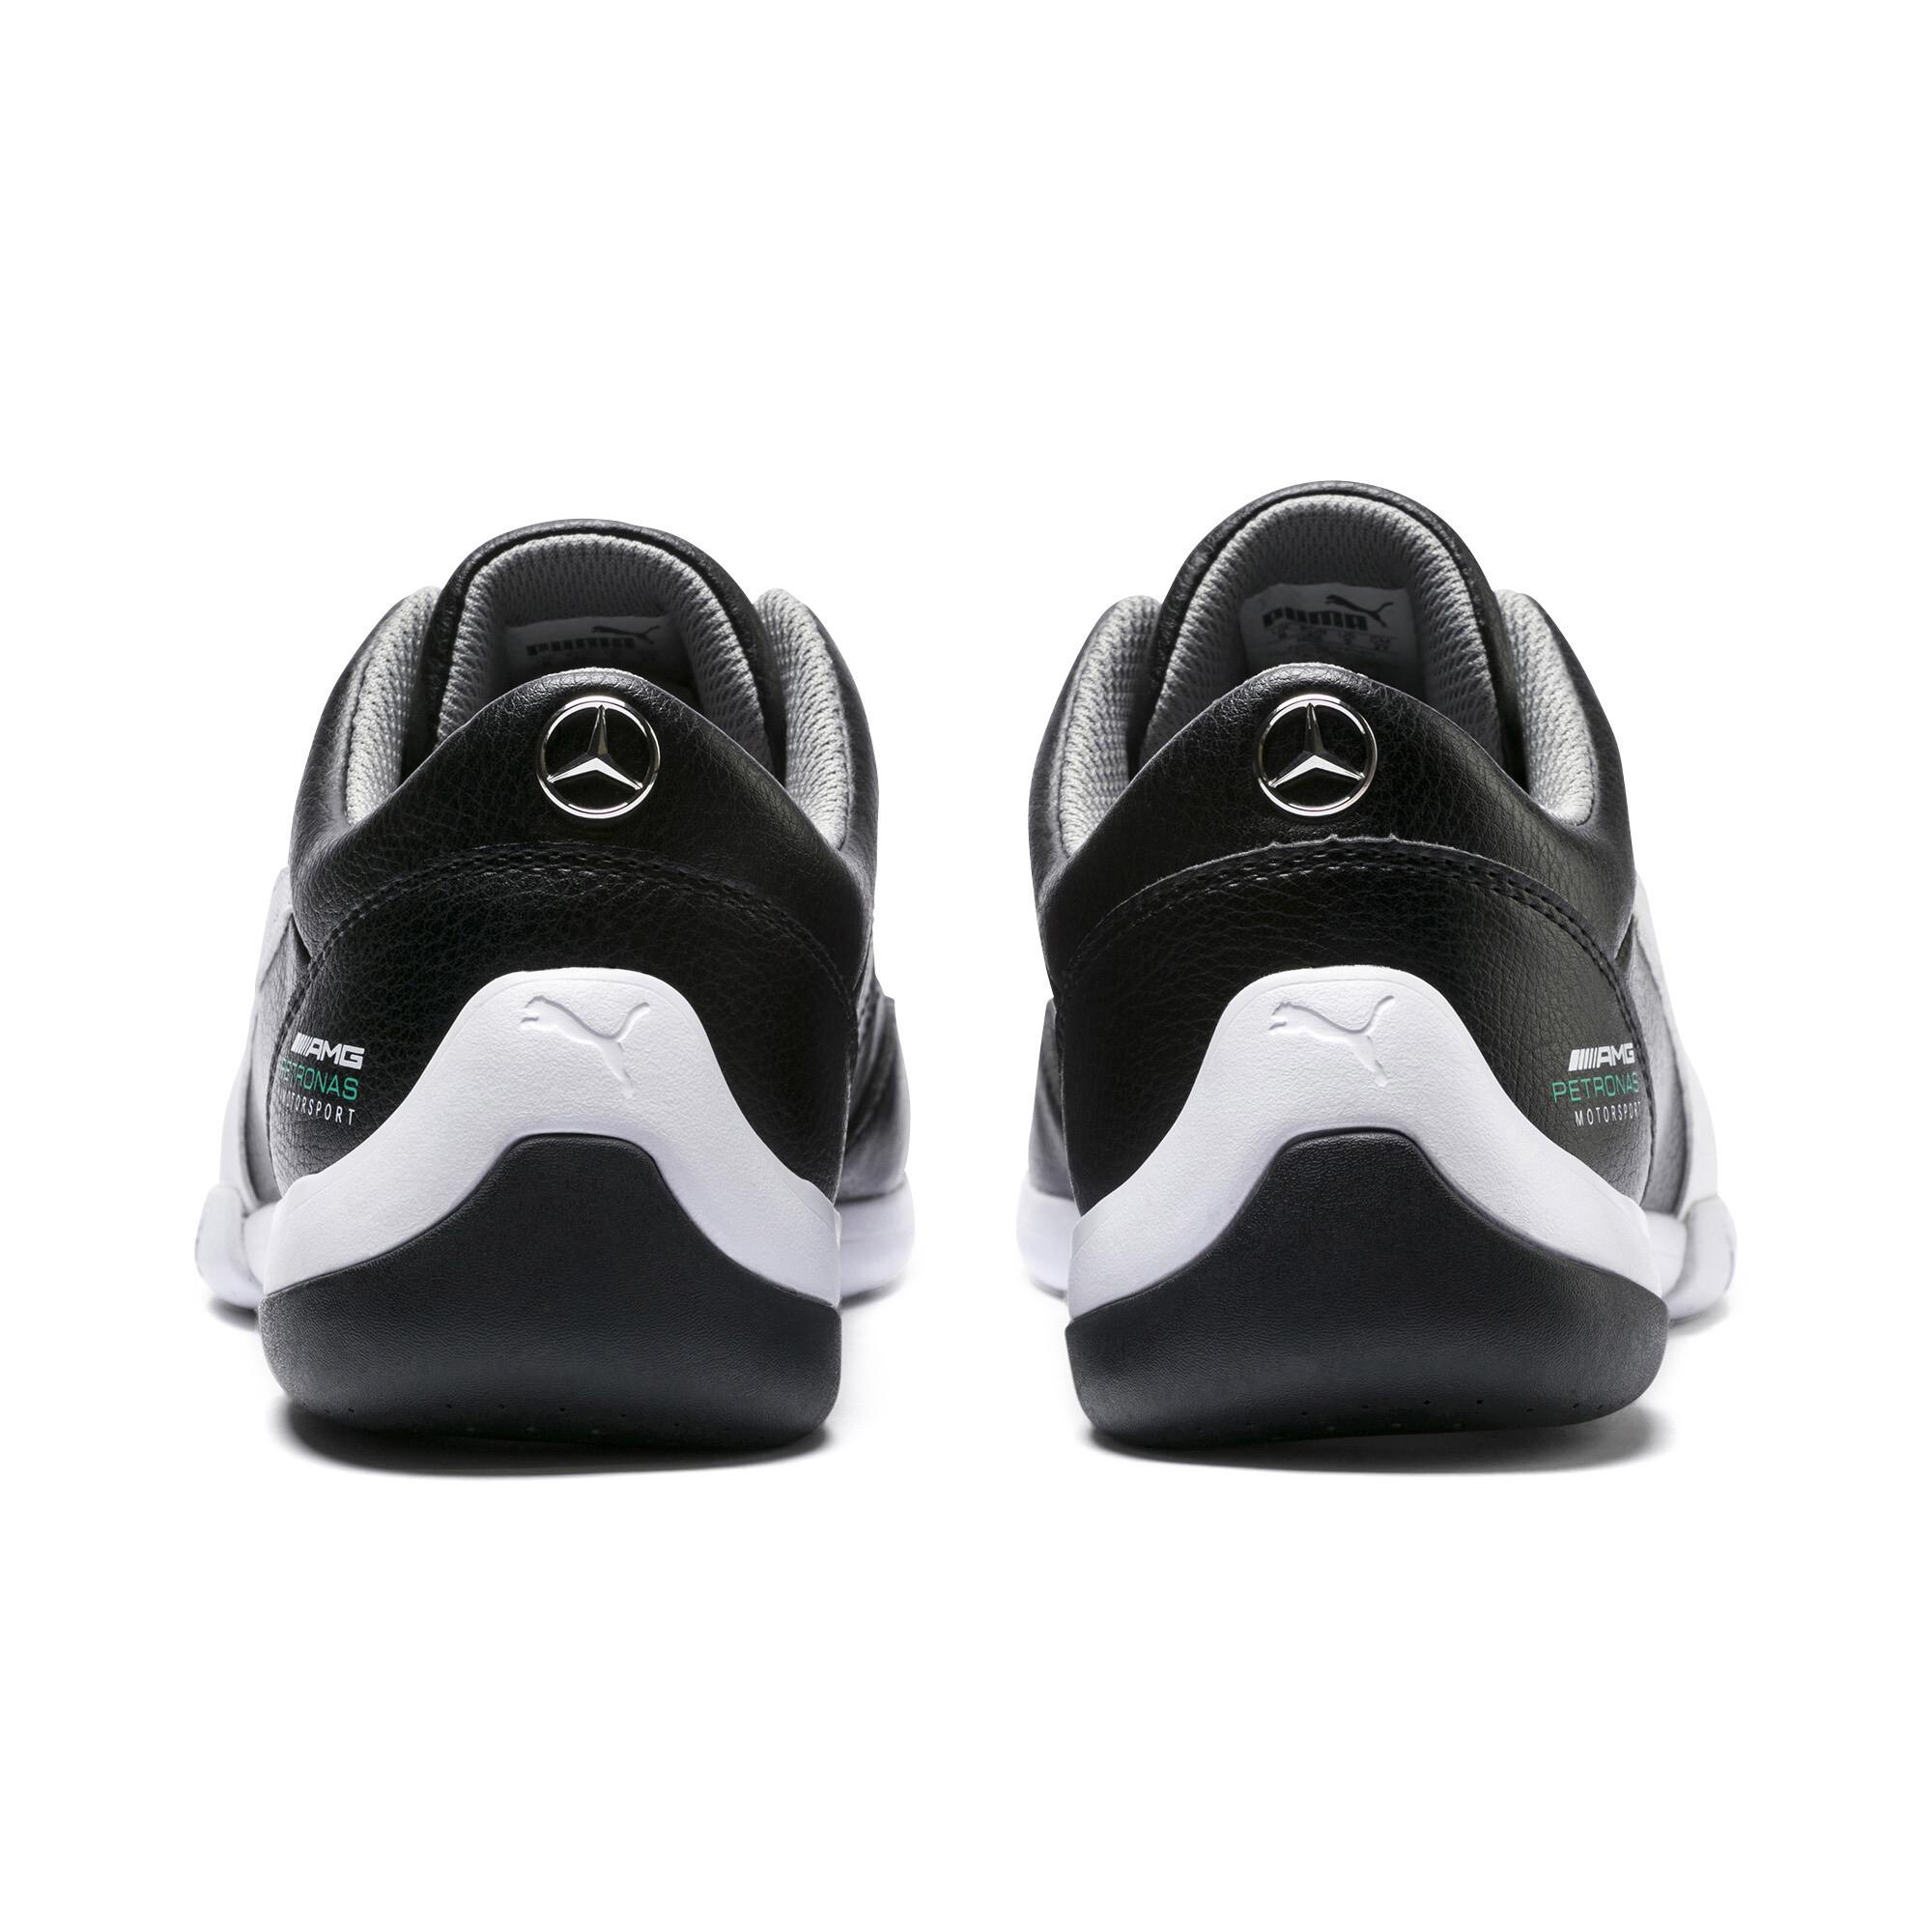 Details about PUMA Men's Mercedes AMG Petronas Kart Cat III Shoes